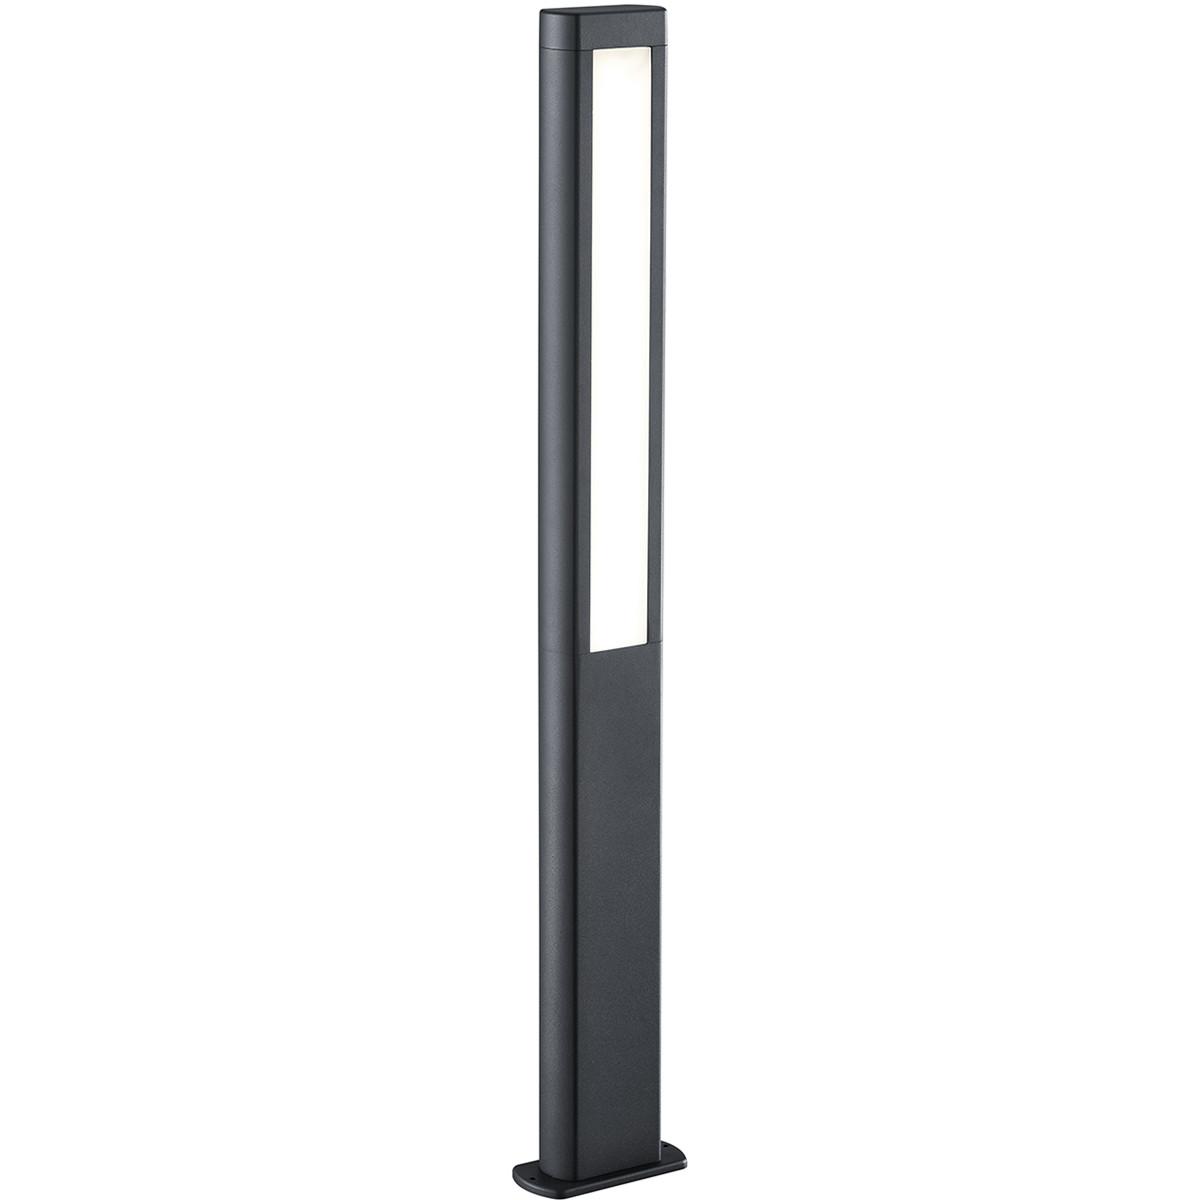 LED Tuinverlichting - Buitenlamp - Trion Rhinon XL - Staand - 10W - Mat Antraciet - Aluminium